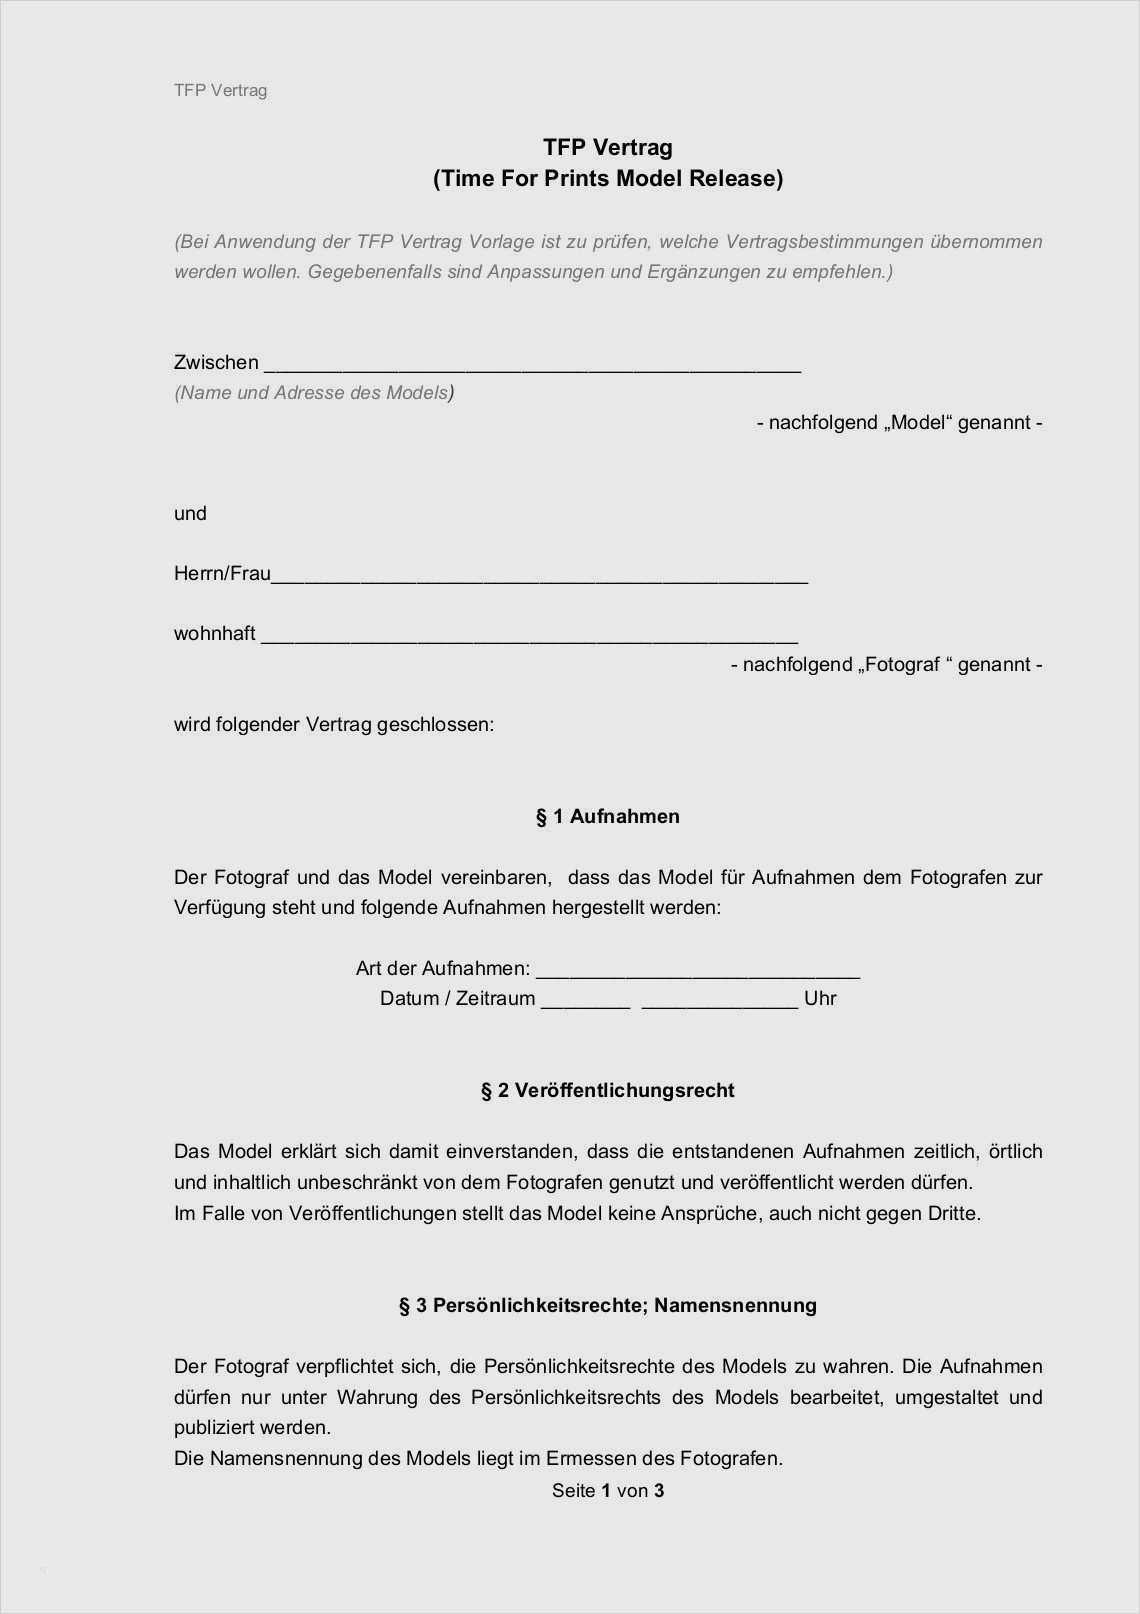 Model Release Vereinbarung Muster Vorlage Word Pdf 1